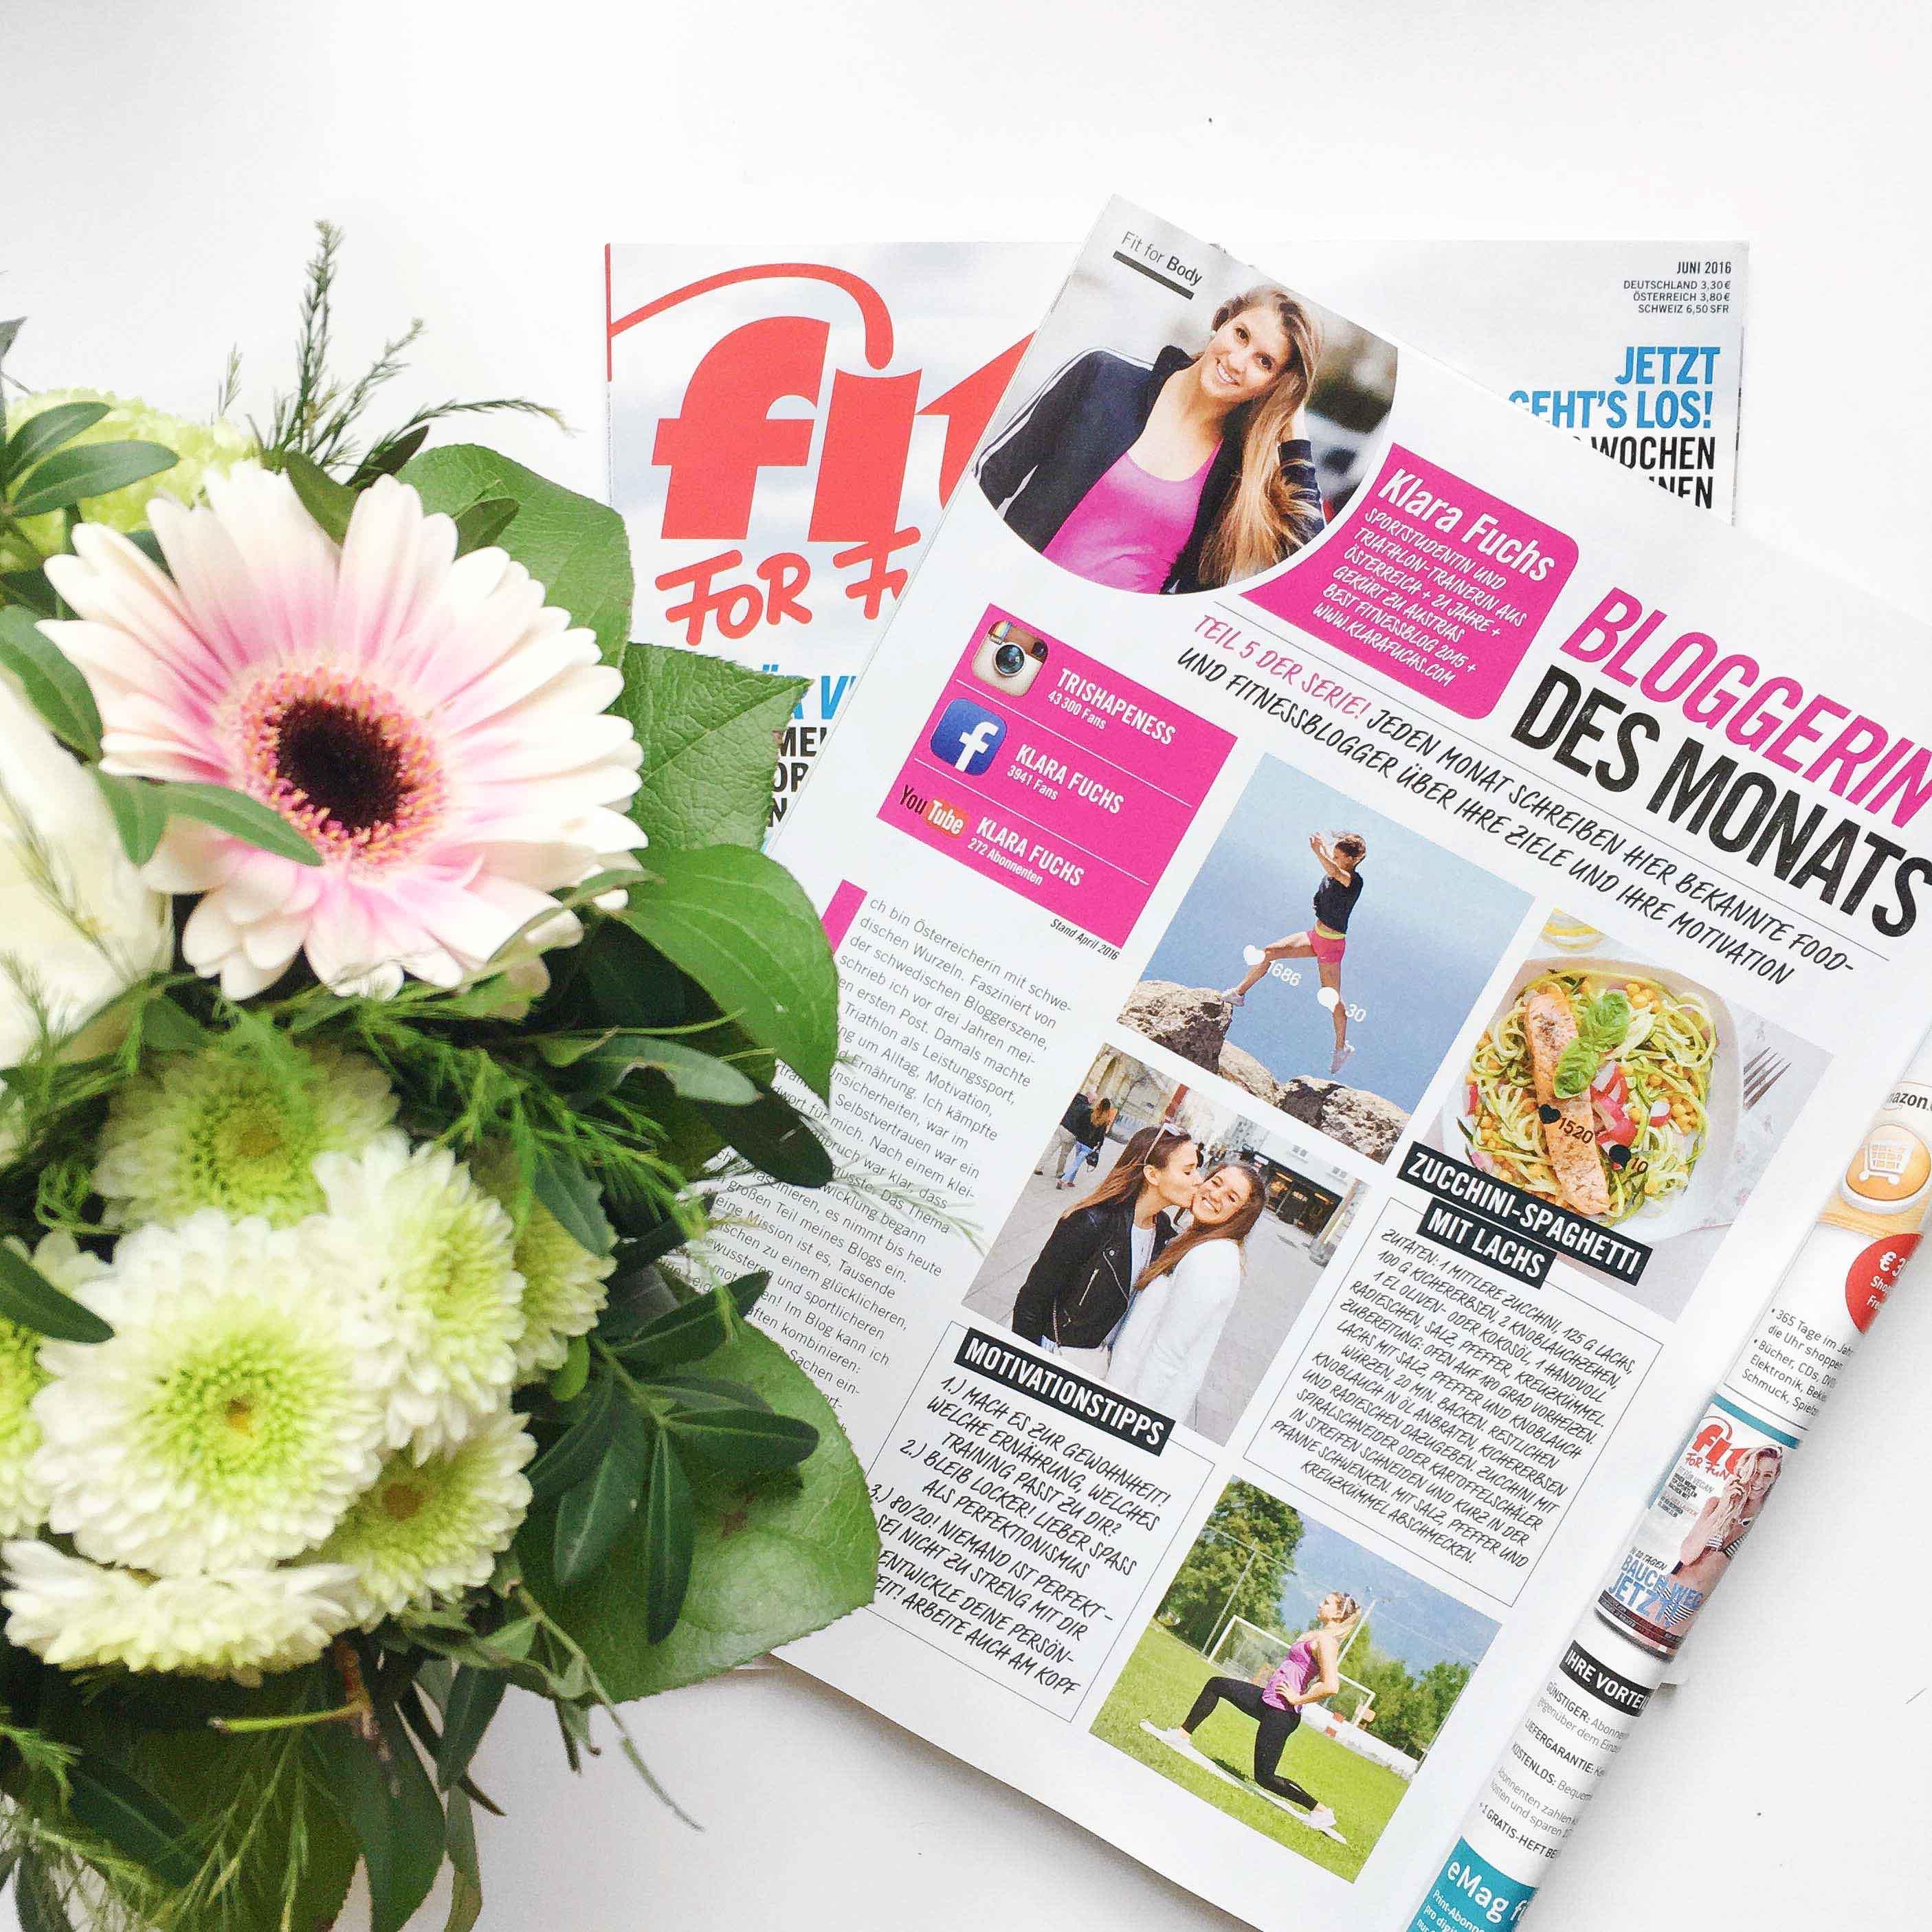 klara-fuchs-presse-medienpra%cc%88senz-pr-fitforfun-2016